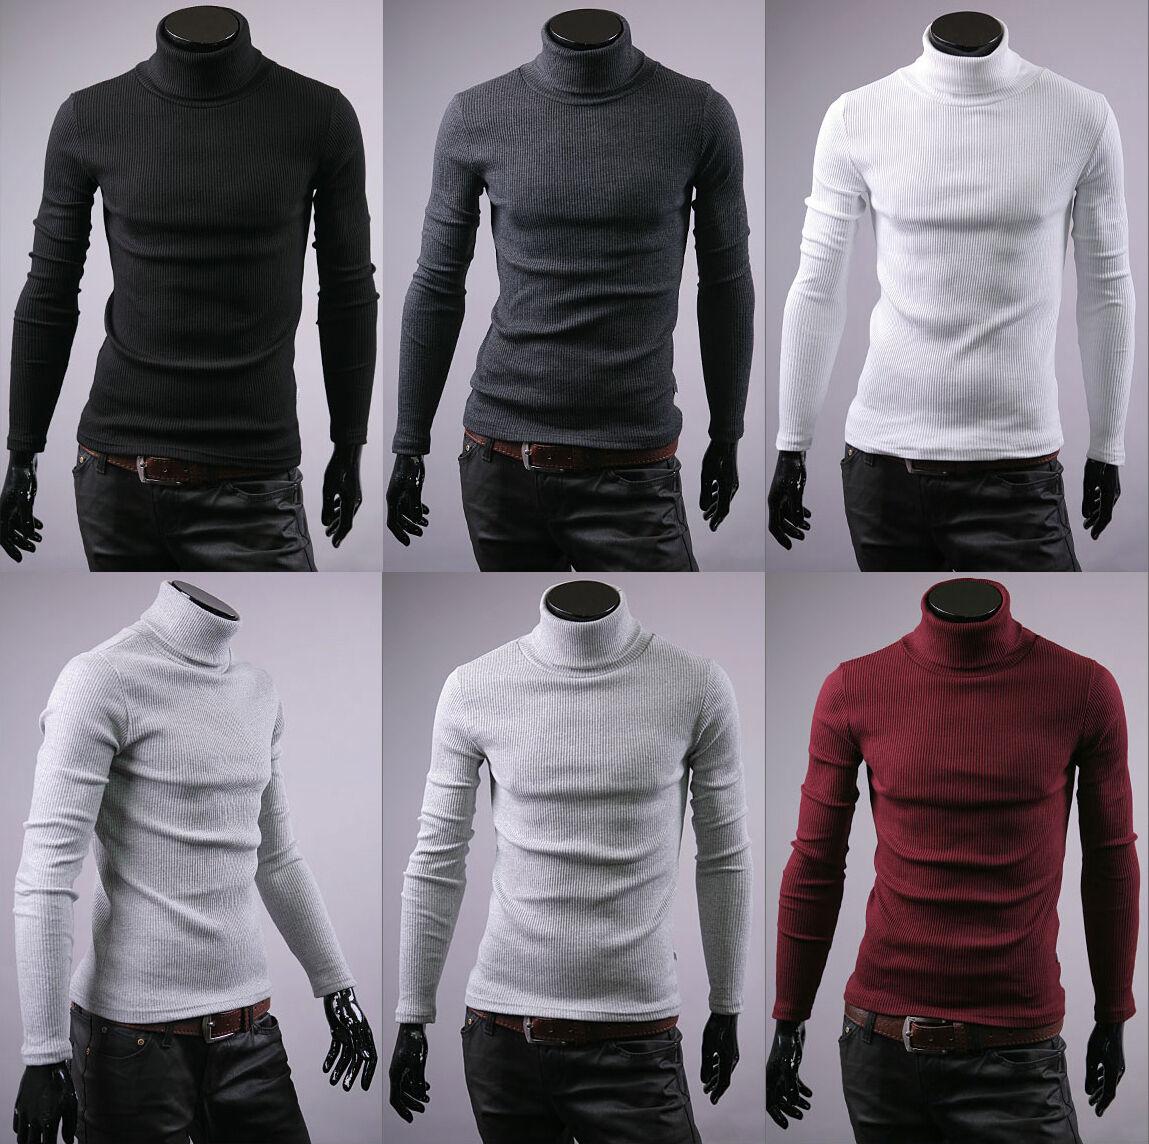 New mens cotton turtle neck polo turtleneck sweater stretch jumper us size S M L